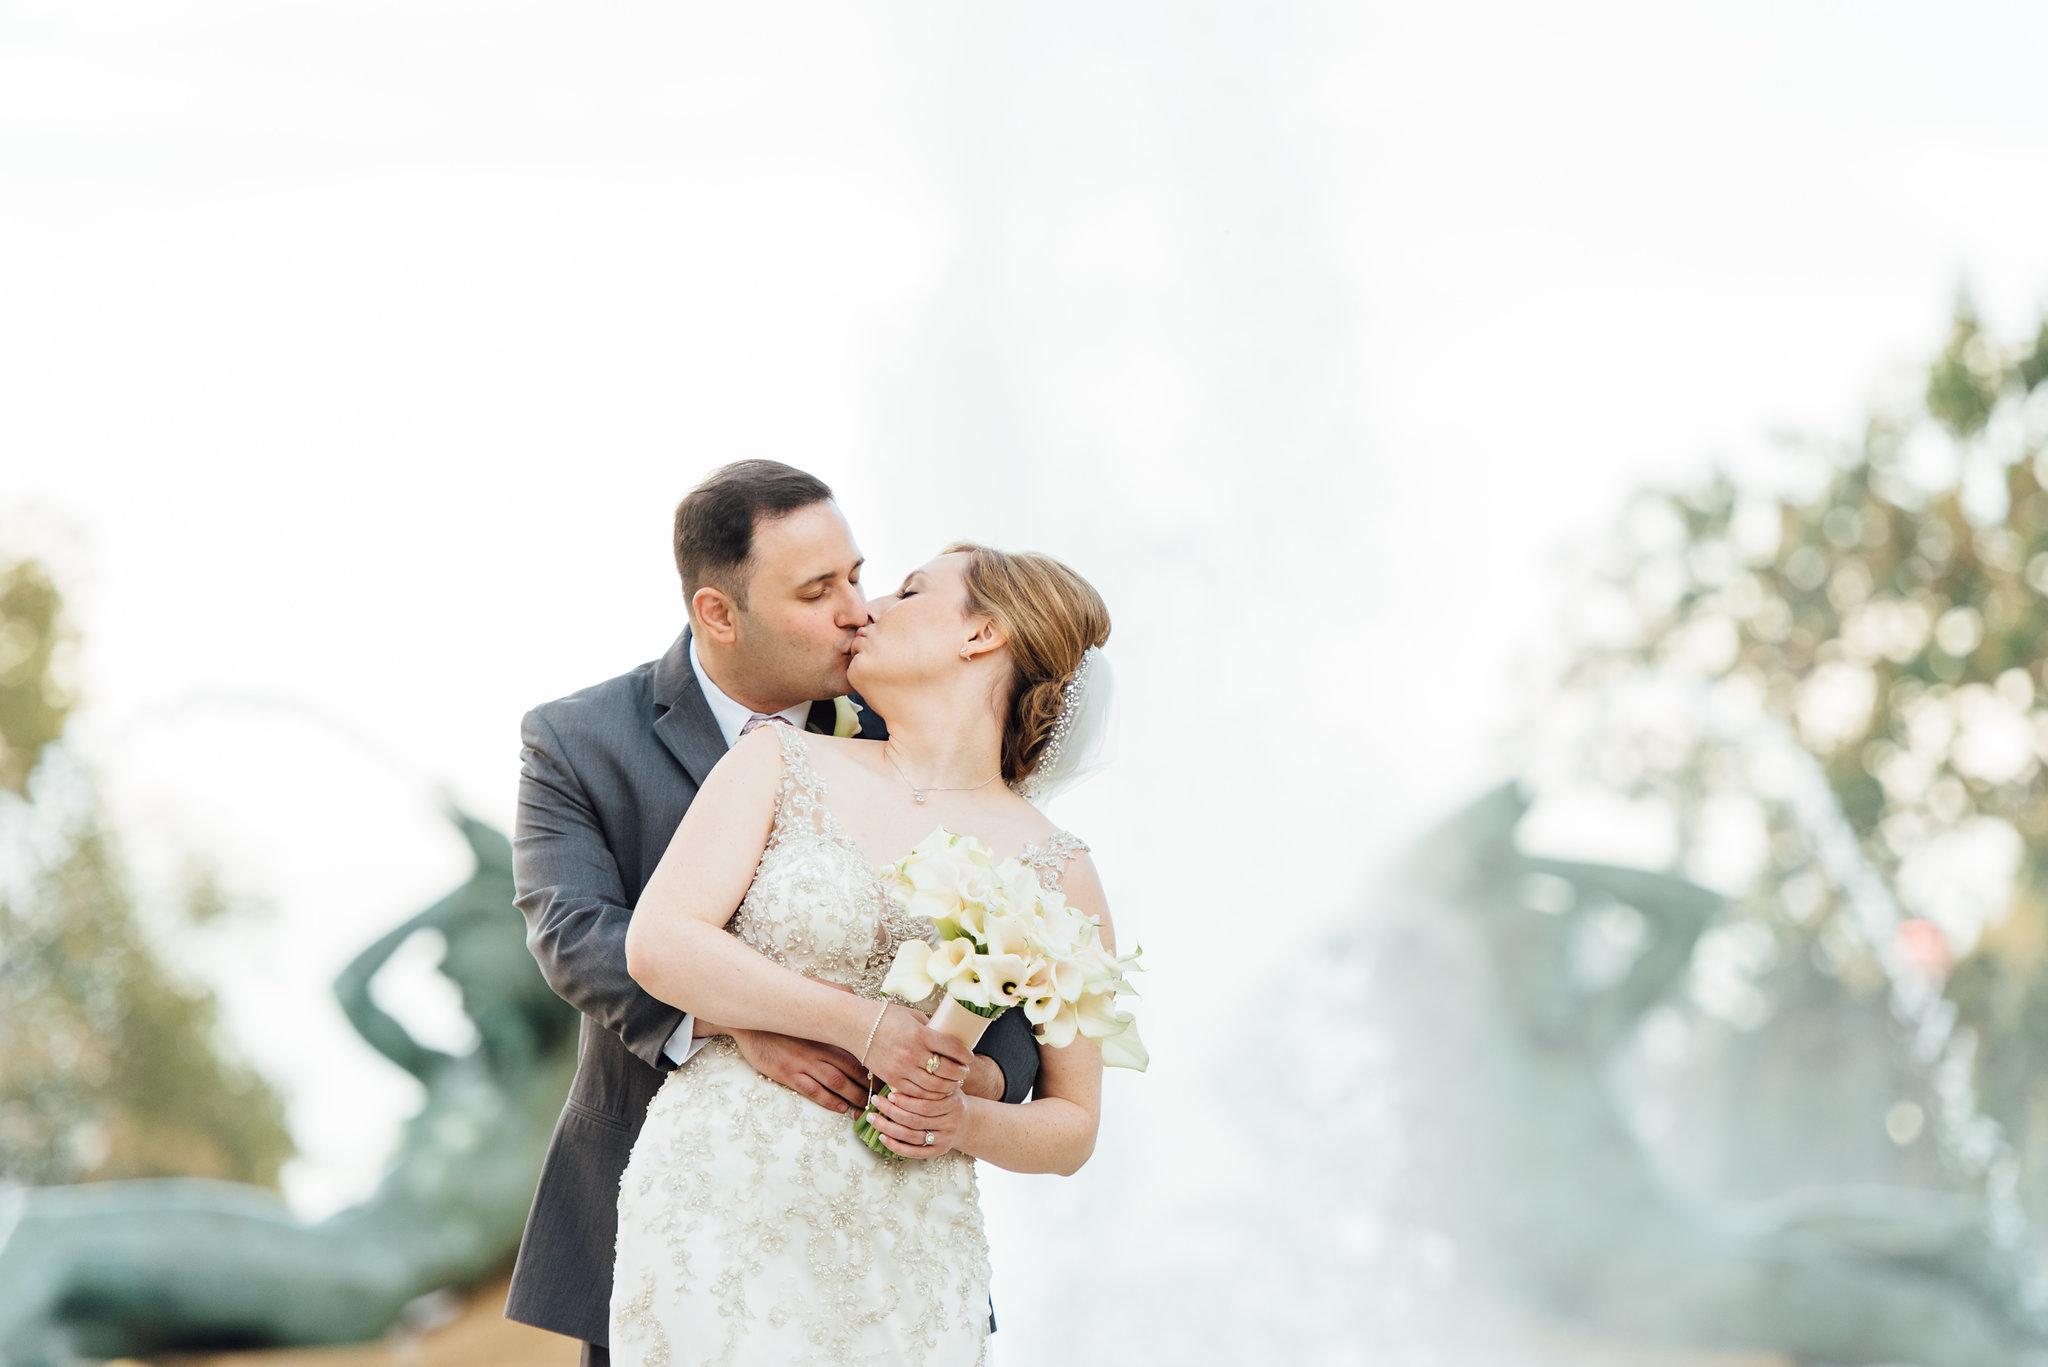 Lisa and Elias | The Logan Philadelphia Wedding | The Styled Bride